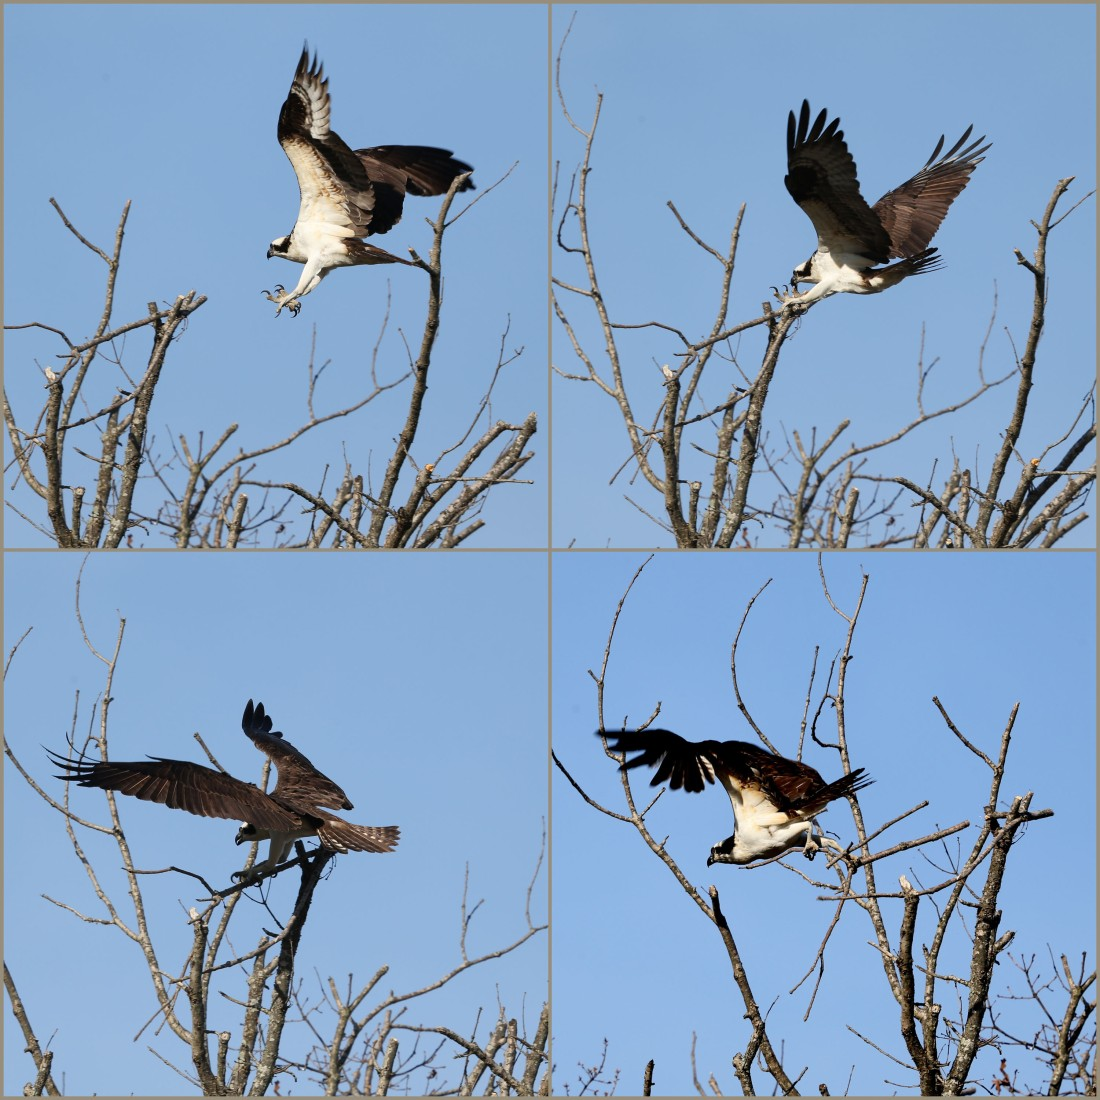 Osprey gathering nesting material